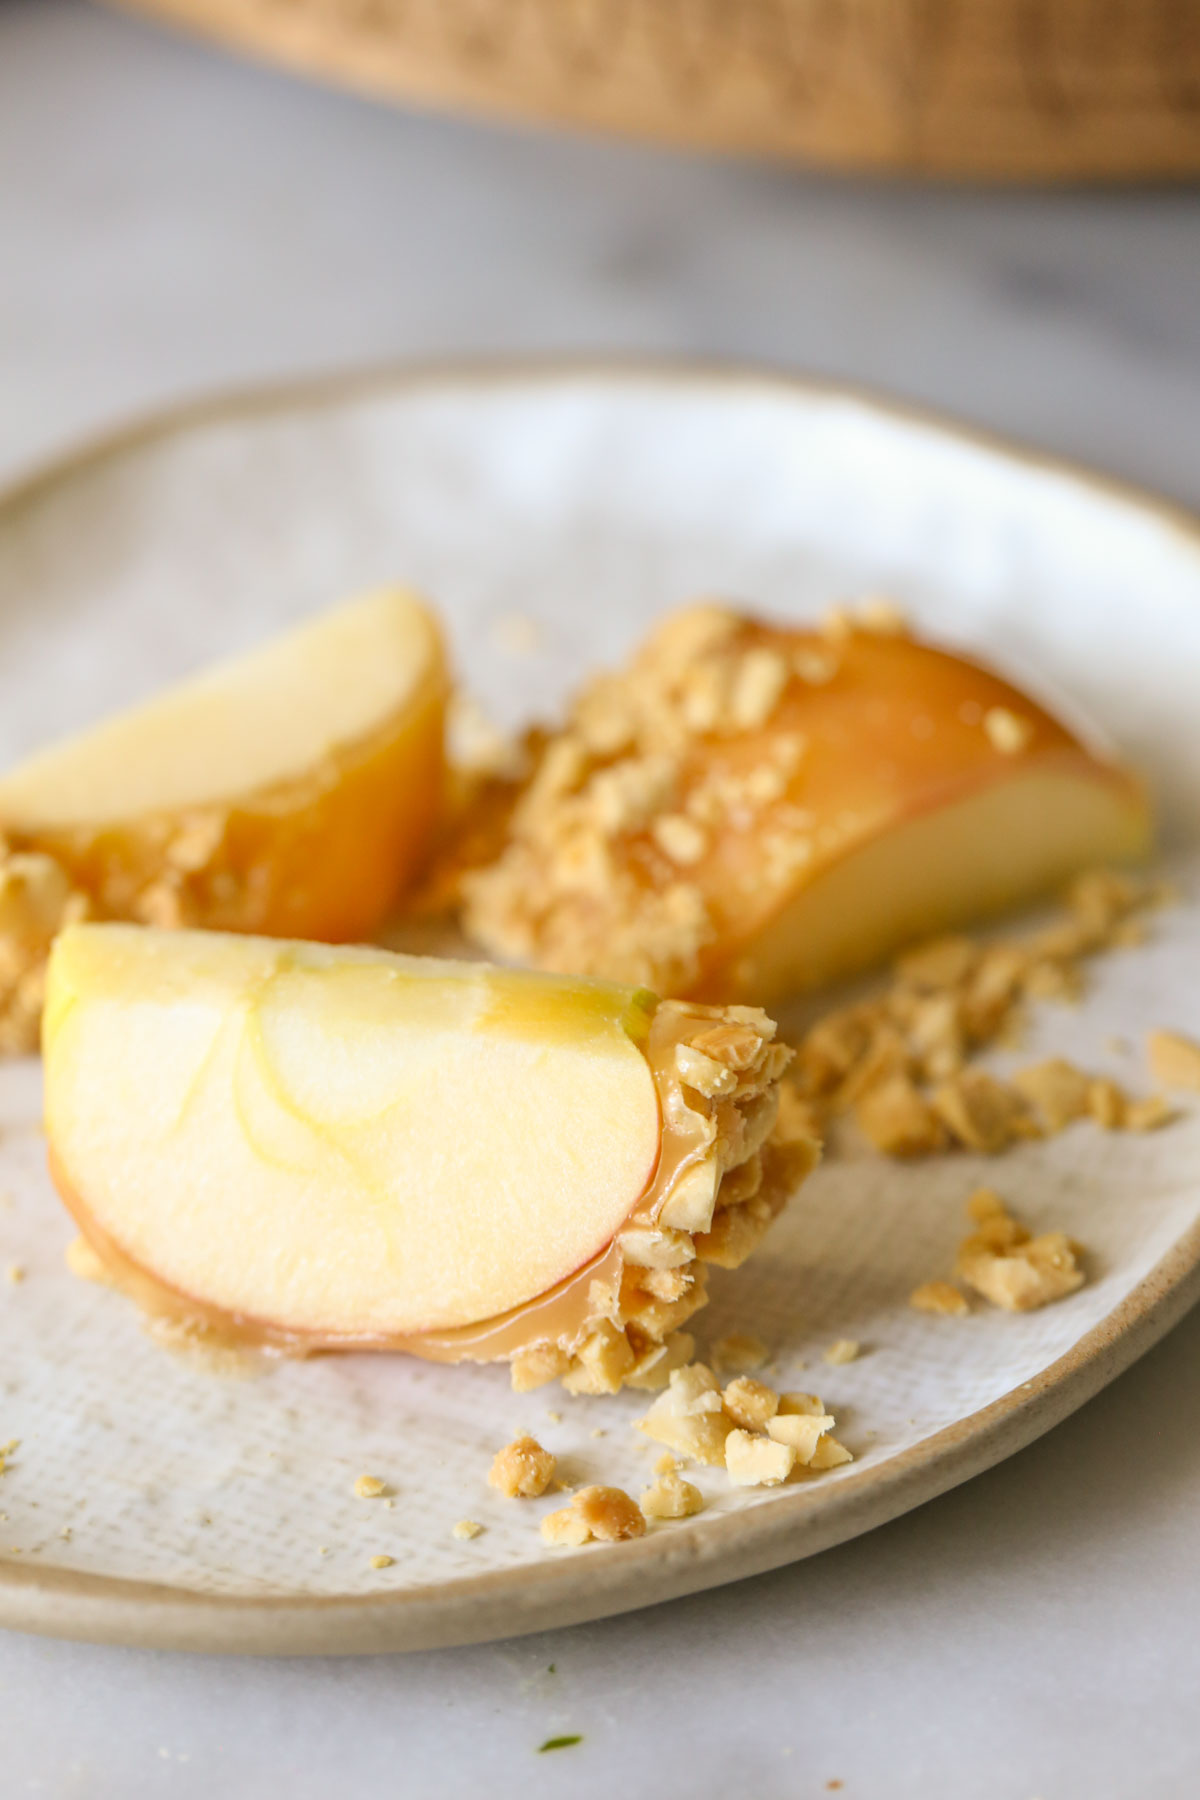 Close up shot of a sliced Homemade Caramel Apple on a plate.